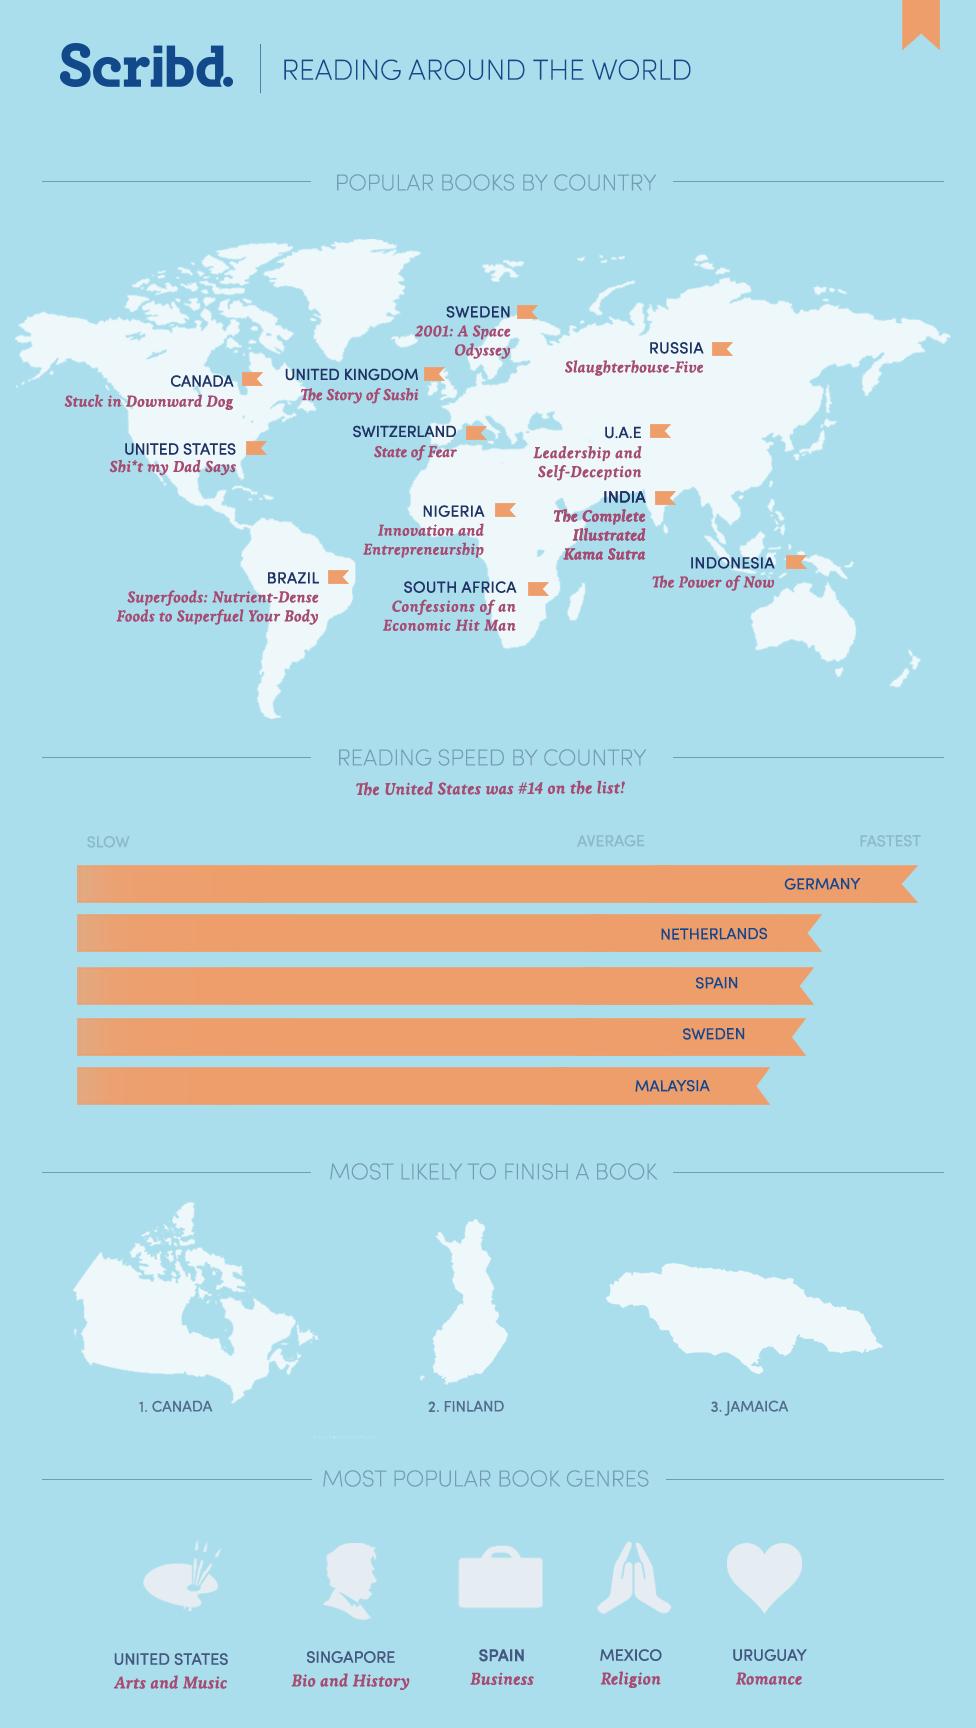 Reading around the world according to Scribd - infographic